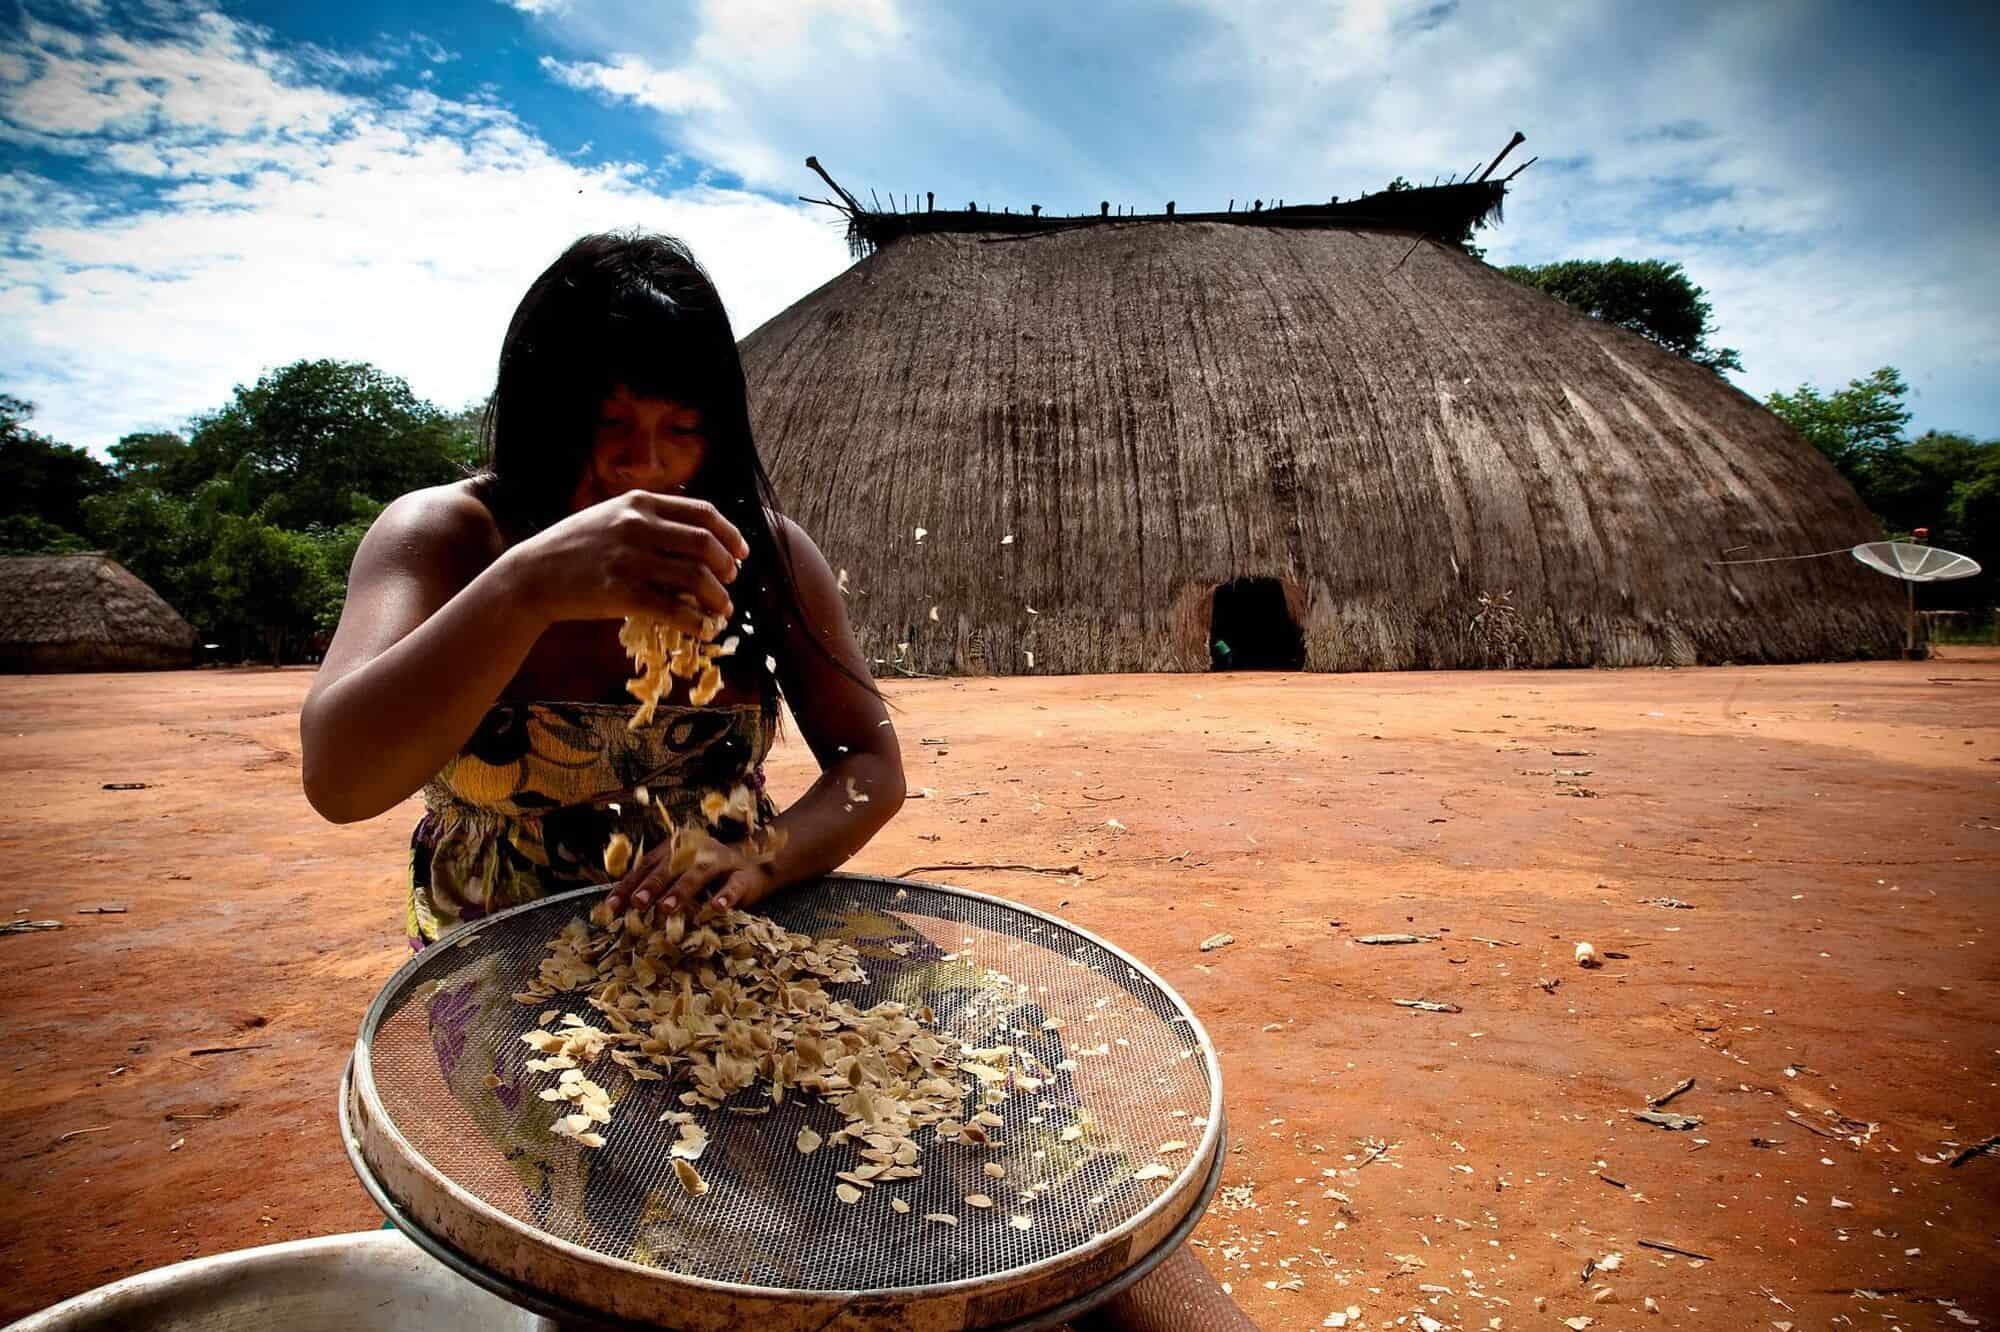 Rede-de-Sementes-do-Xingu-seed-collection-project-credit-Ayrton-Vignola_47f2a5c6ce58a7f1225e360da5263fae